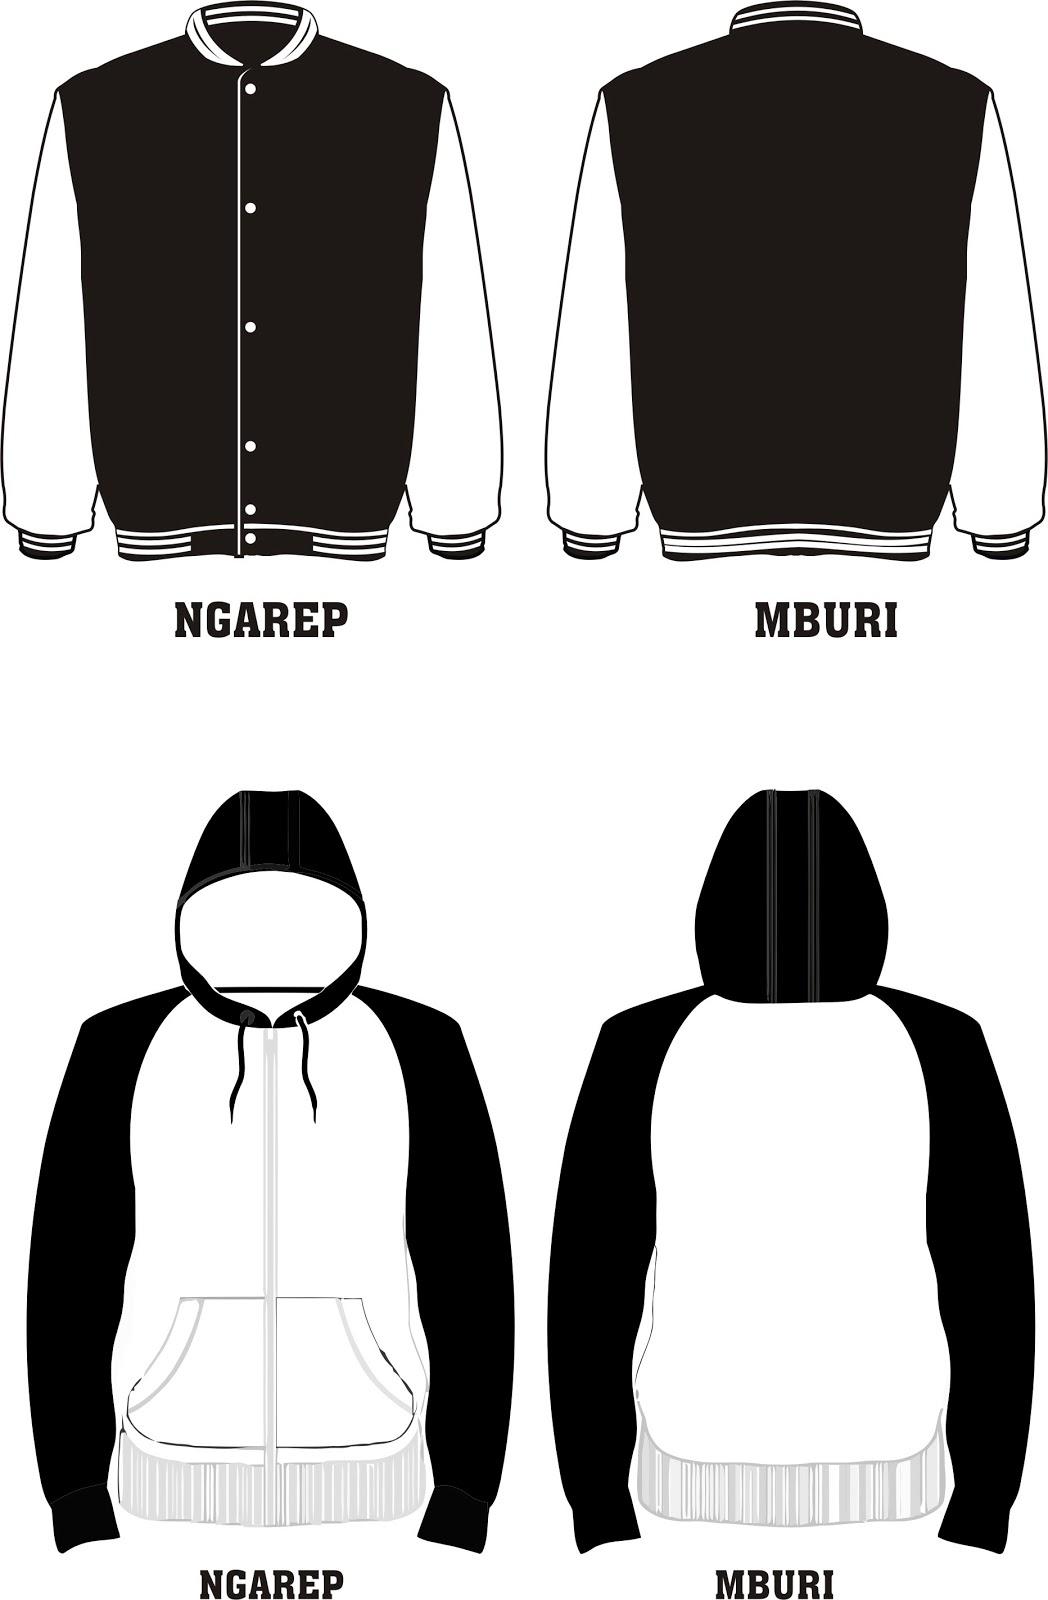 Desain Jaket Bomber Cdr : desain, jaket, bomber, Download, Desain, Jaket, Bomber